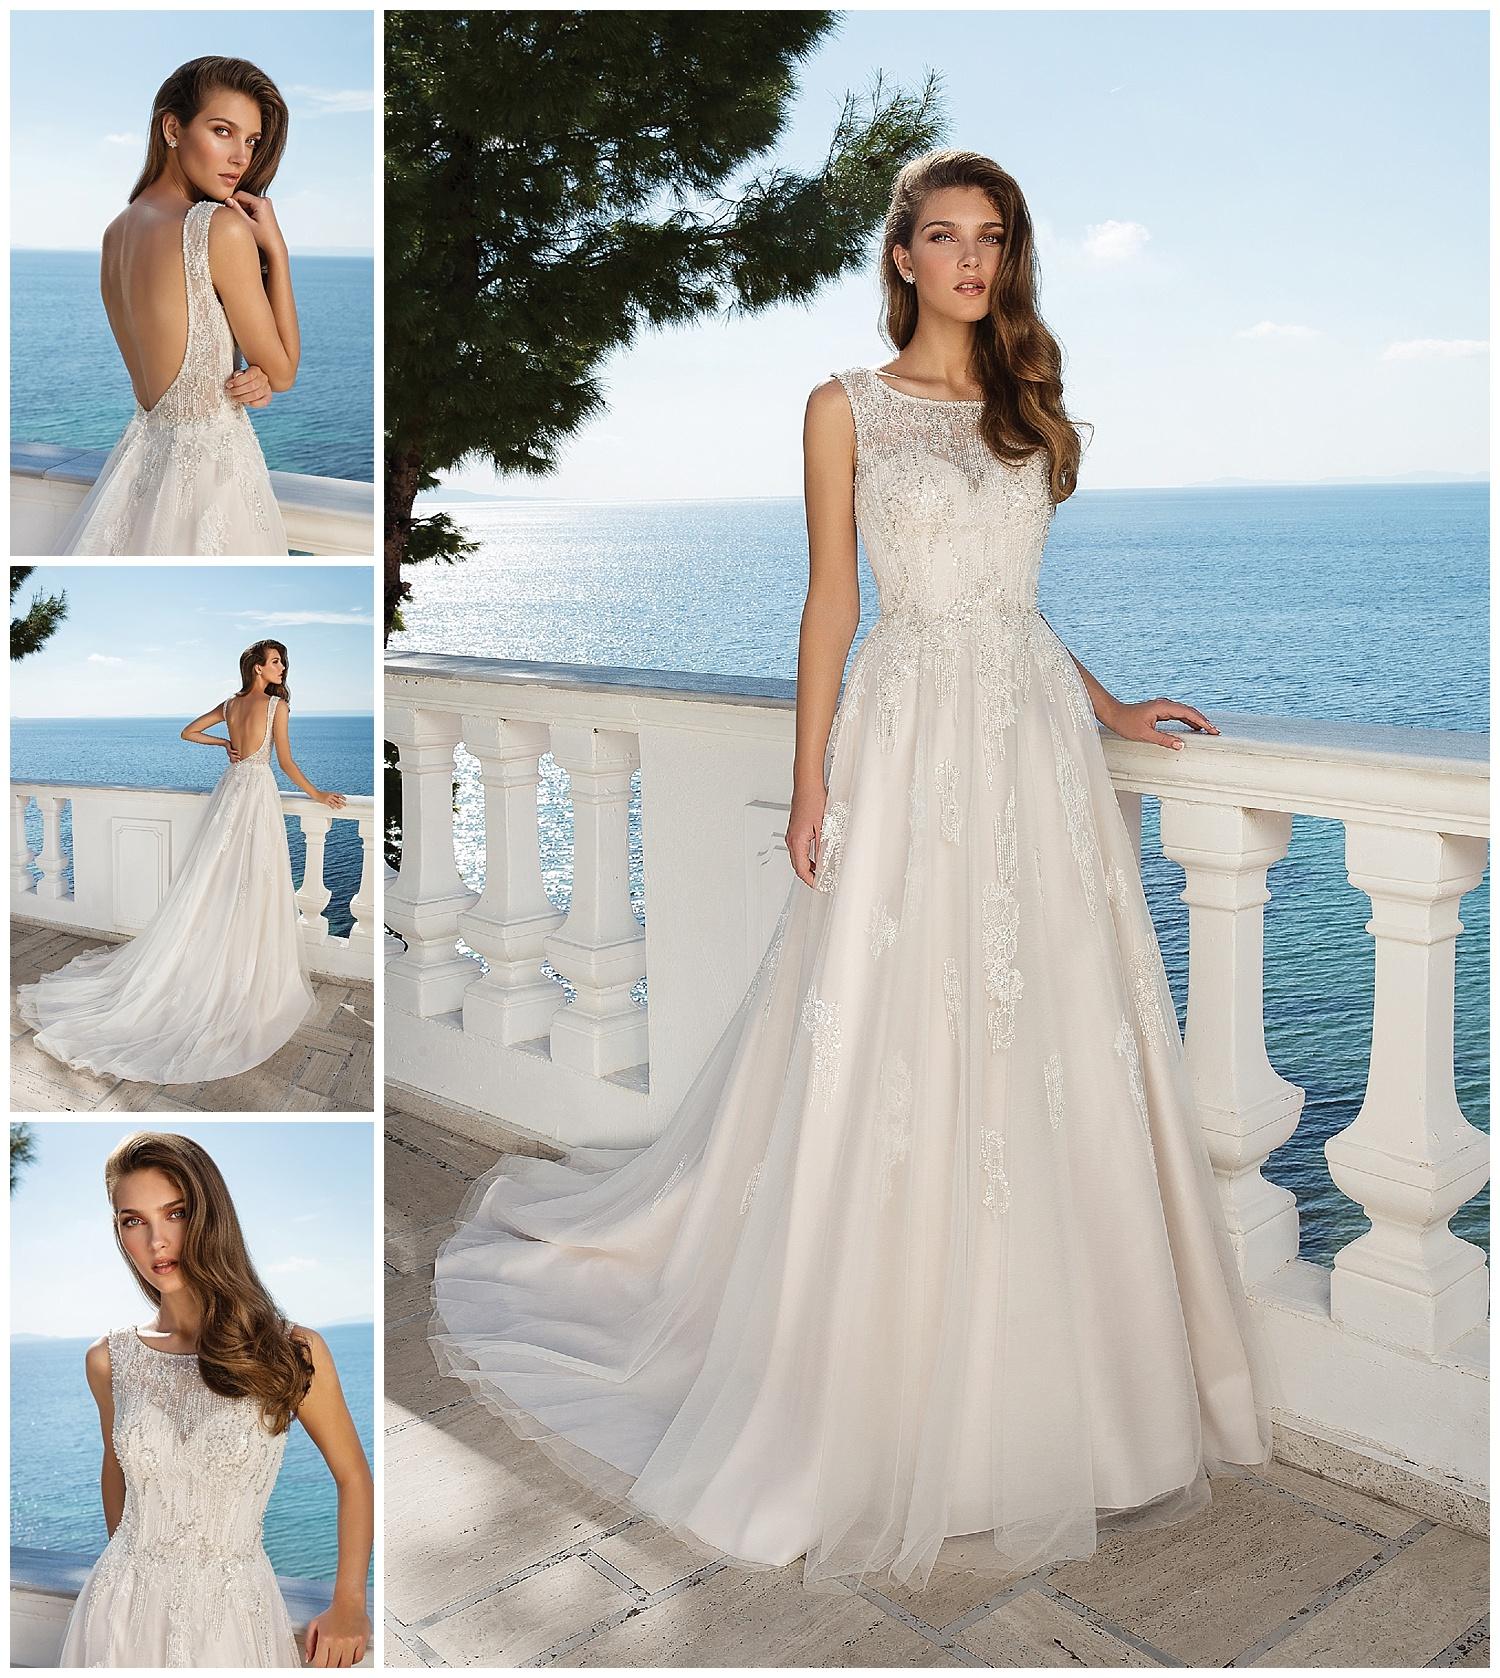 justin-alexander-88091-beaded-ballgown-wedding-dress-epiphany-boutique-carmel-california.jpg